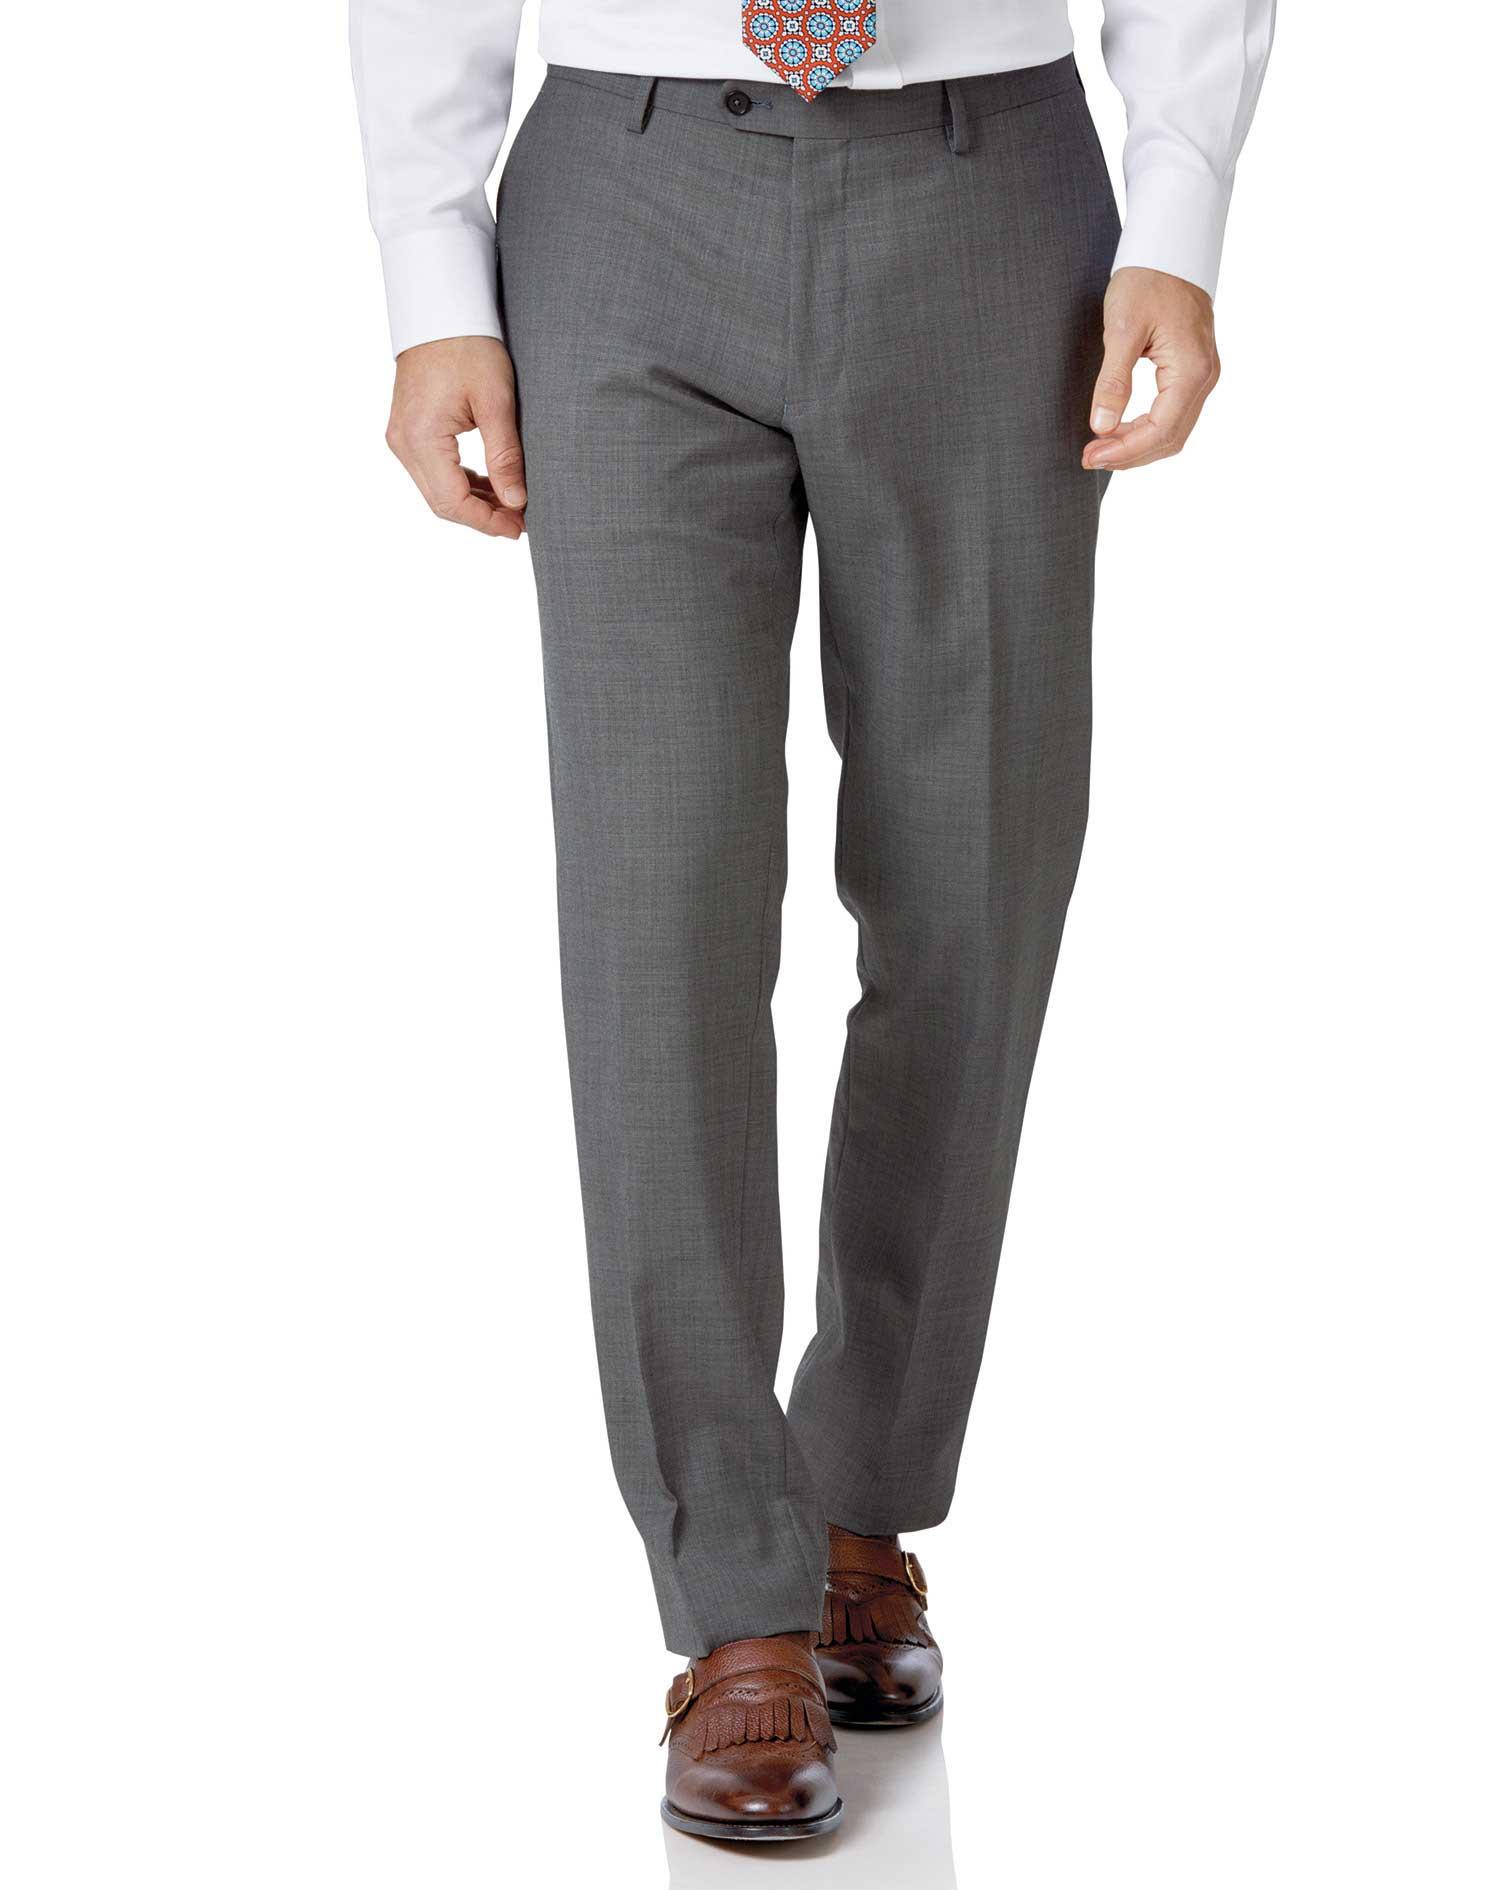 Light Grey Slim Fit Sharkskin Travel Suit Trousers Size W32 L30 by Charles Tyrwhitt